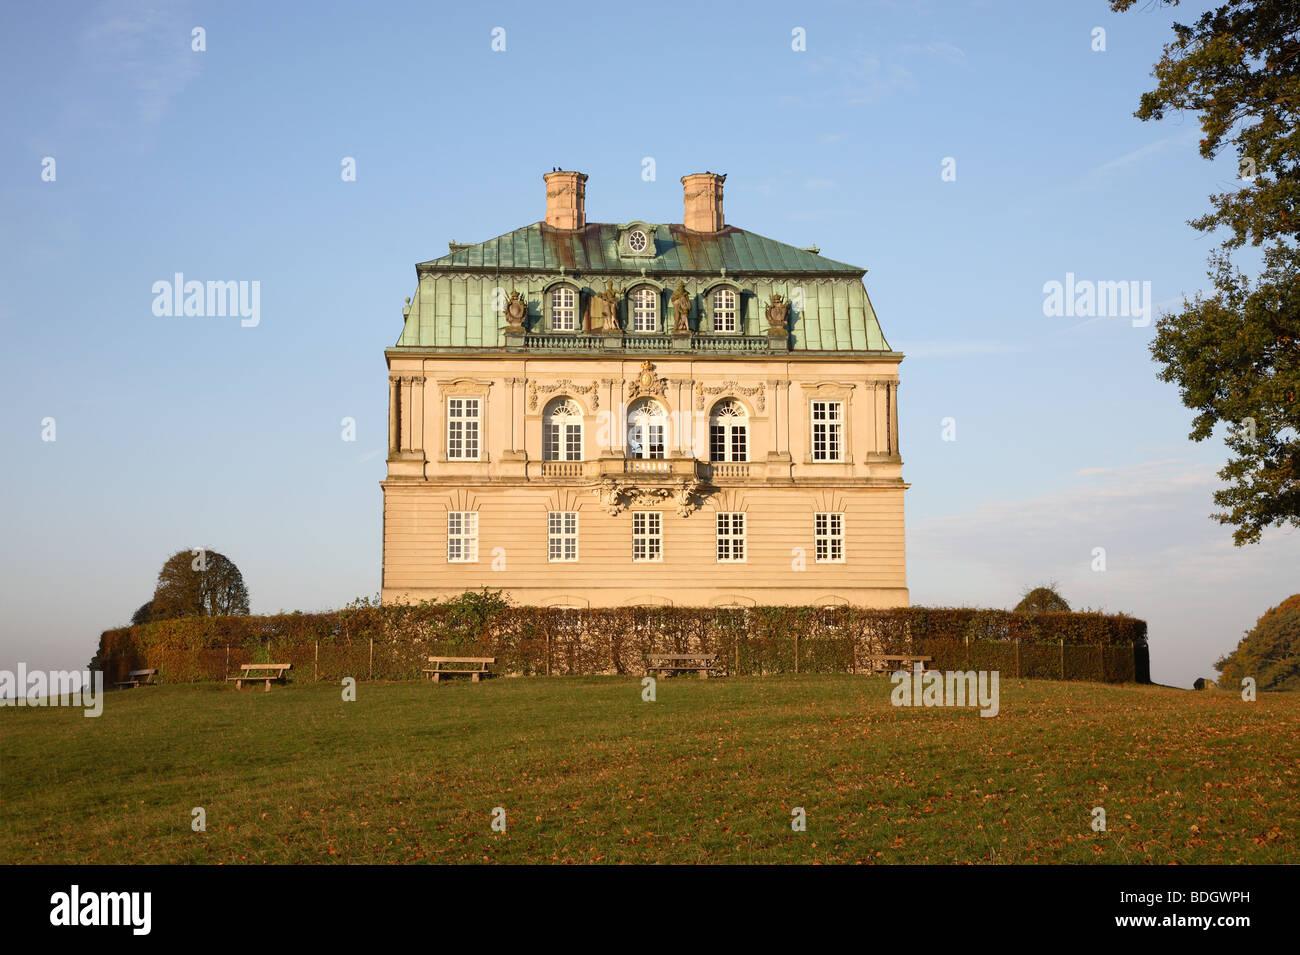 The Hermitage Palace at sunset (Eremitageslottet) in Jægersborg deer park, Dyrehaven,  north of Copenhagen, - Stock Image